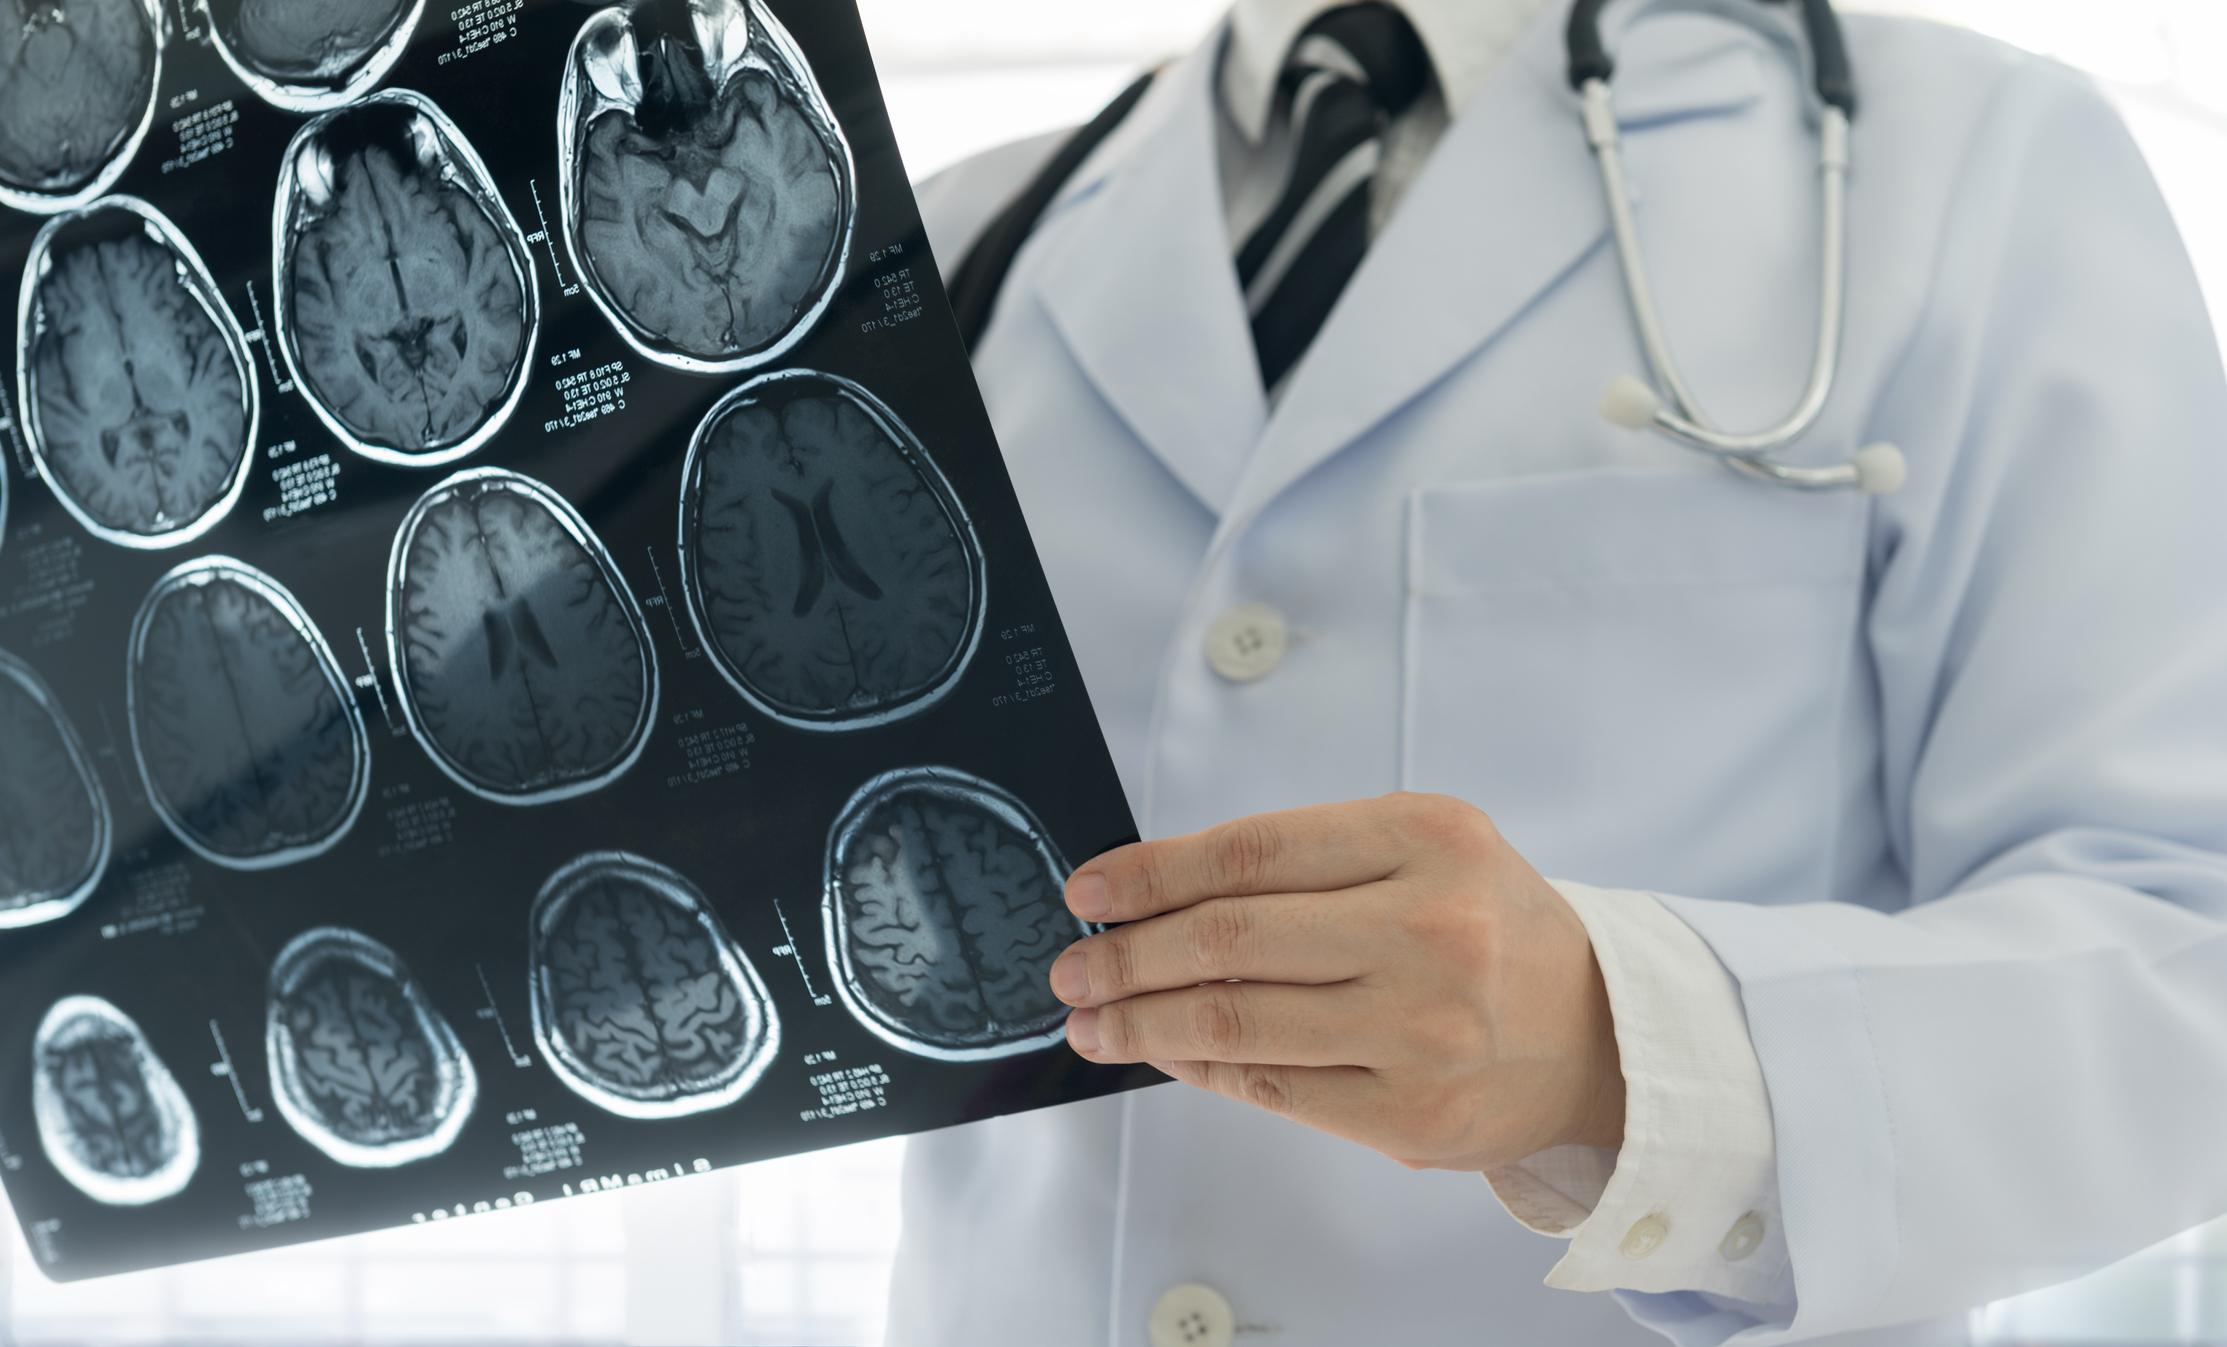 MRI Gadolinium-Based Contrast Agents (GBCA) Can Harm Your Health